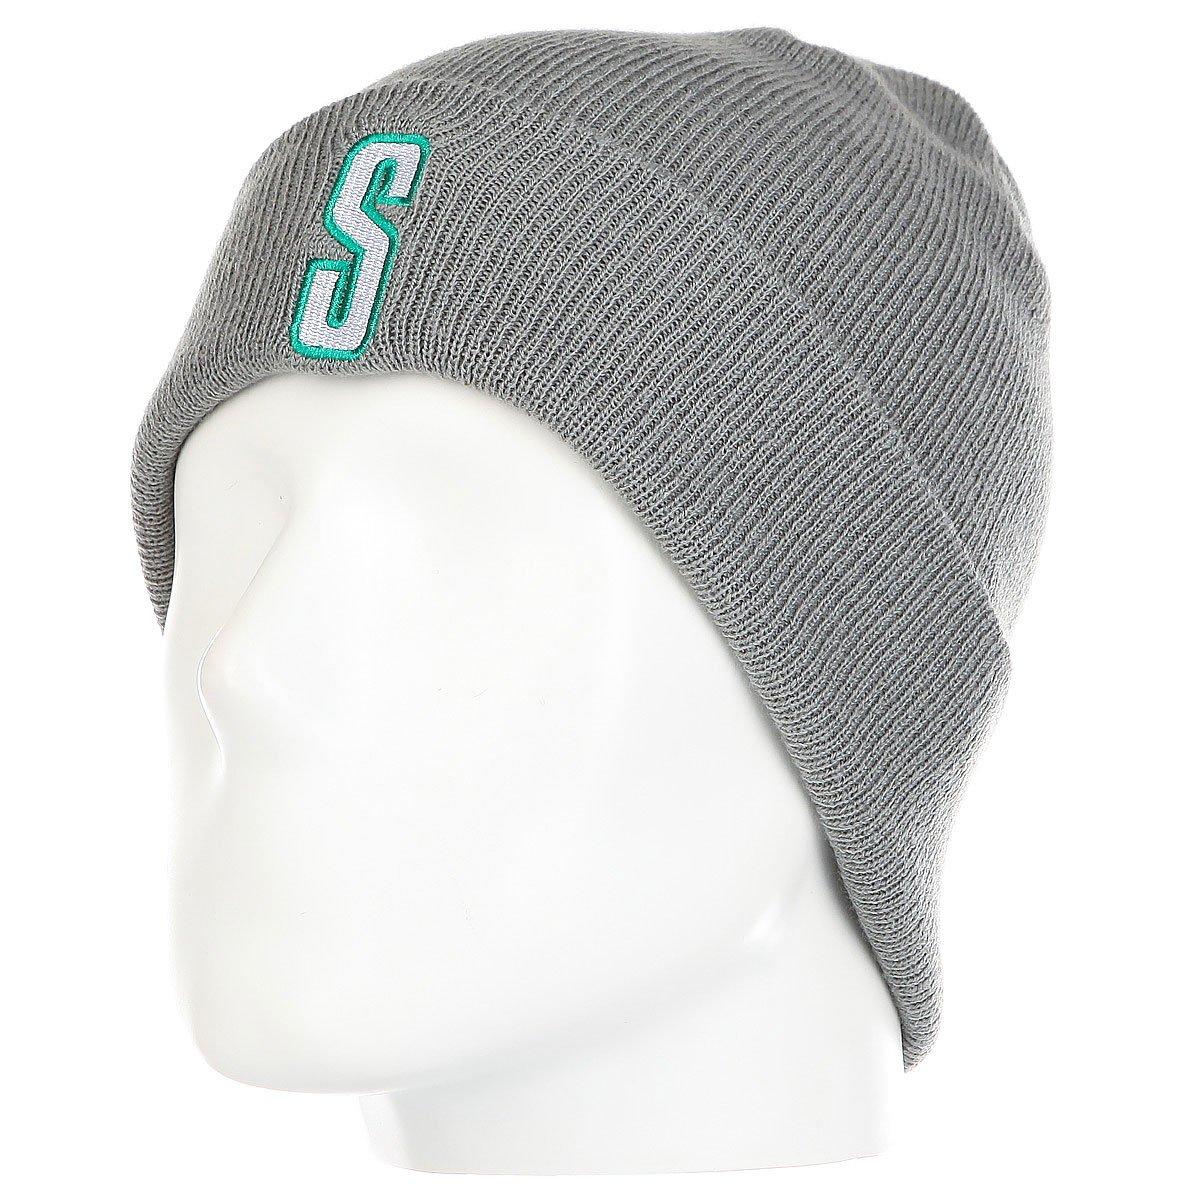 1ebb427a917 Купить шапку Stussy Vintage S Cuff Beanie Grey в интернет-магазине ...